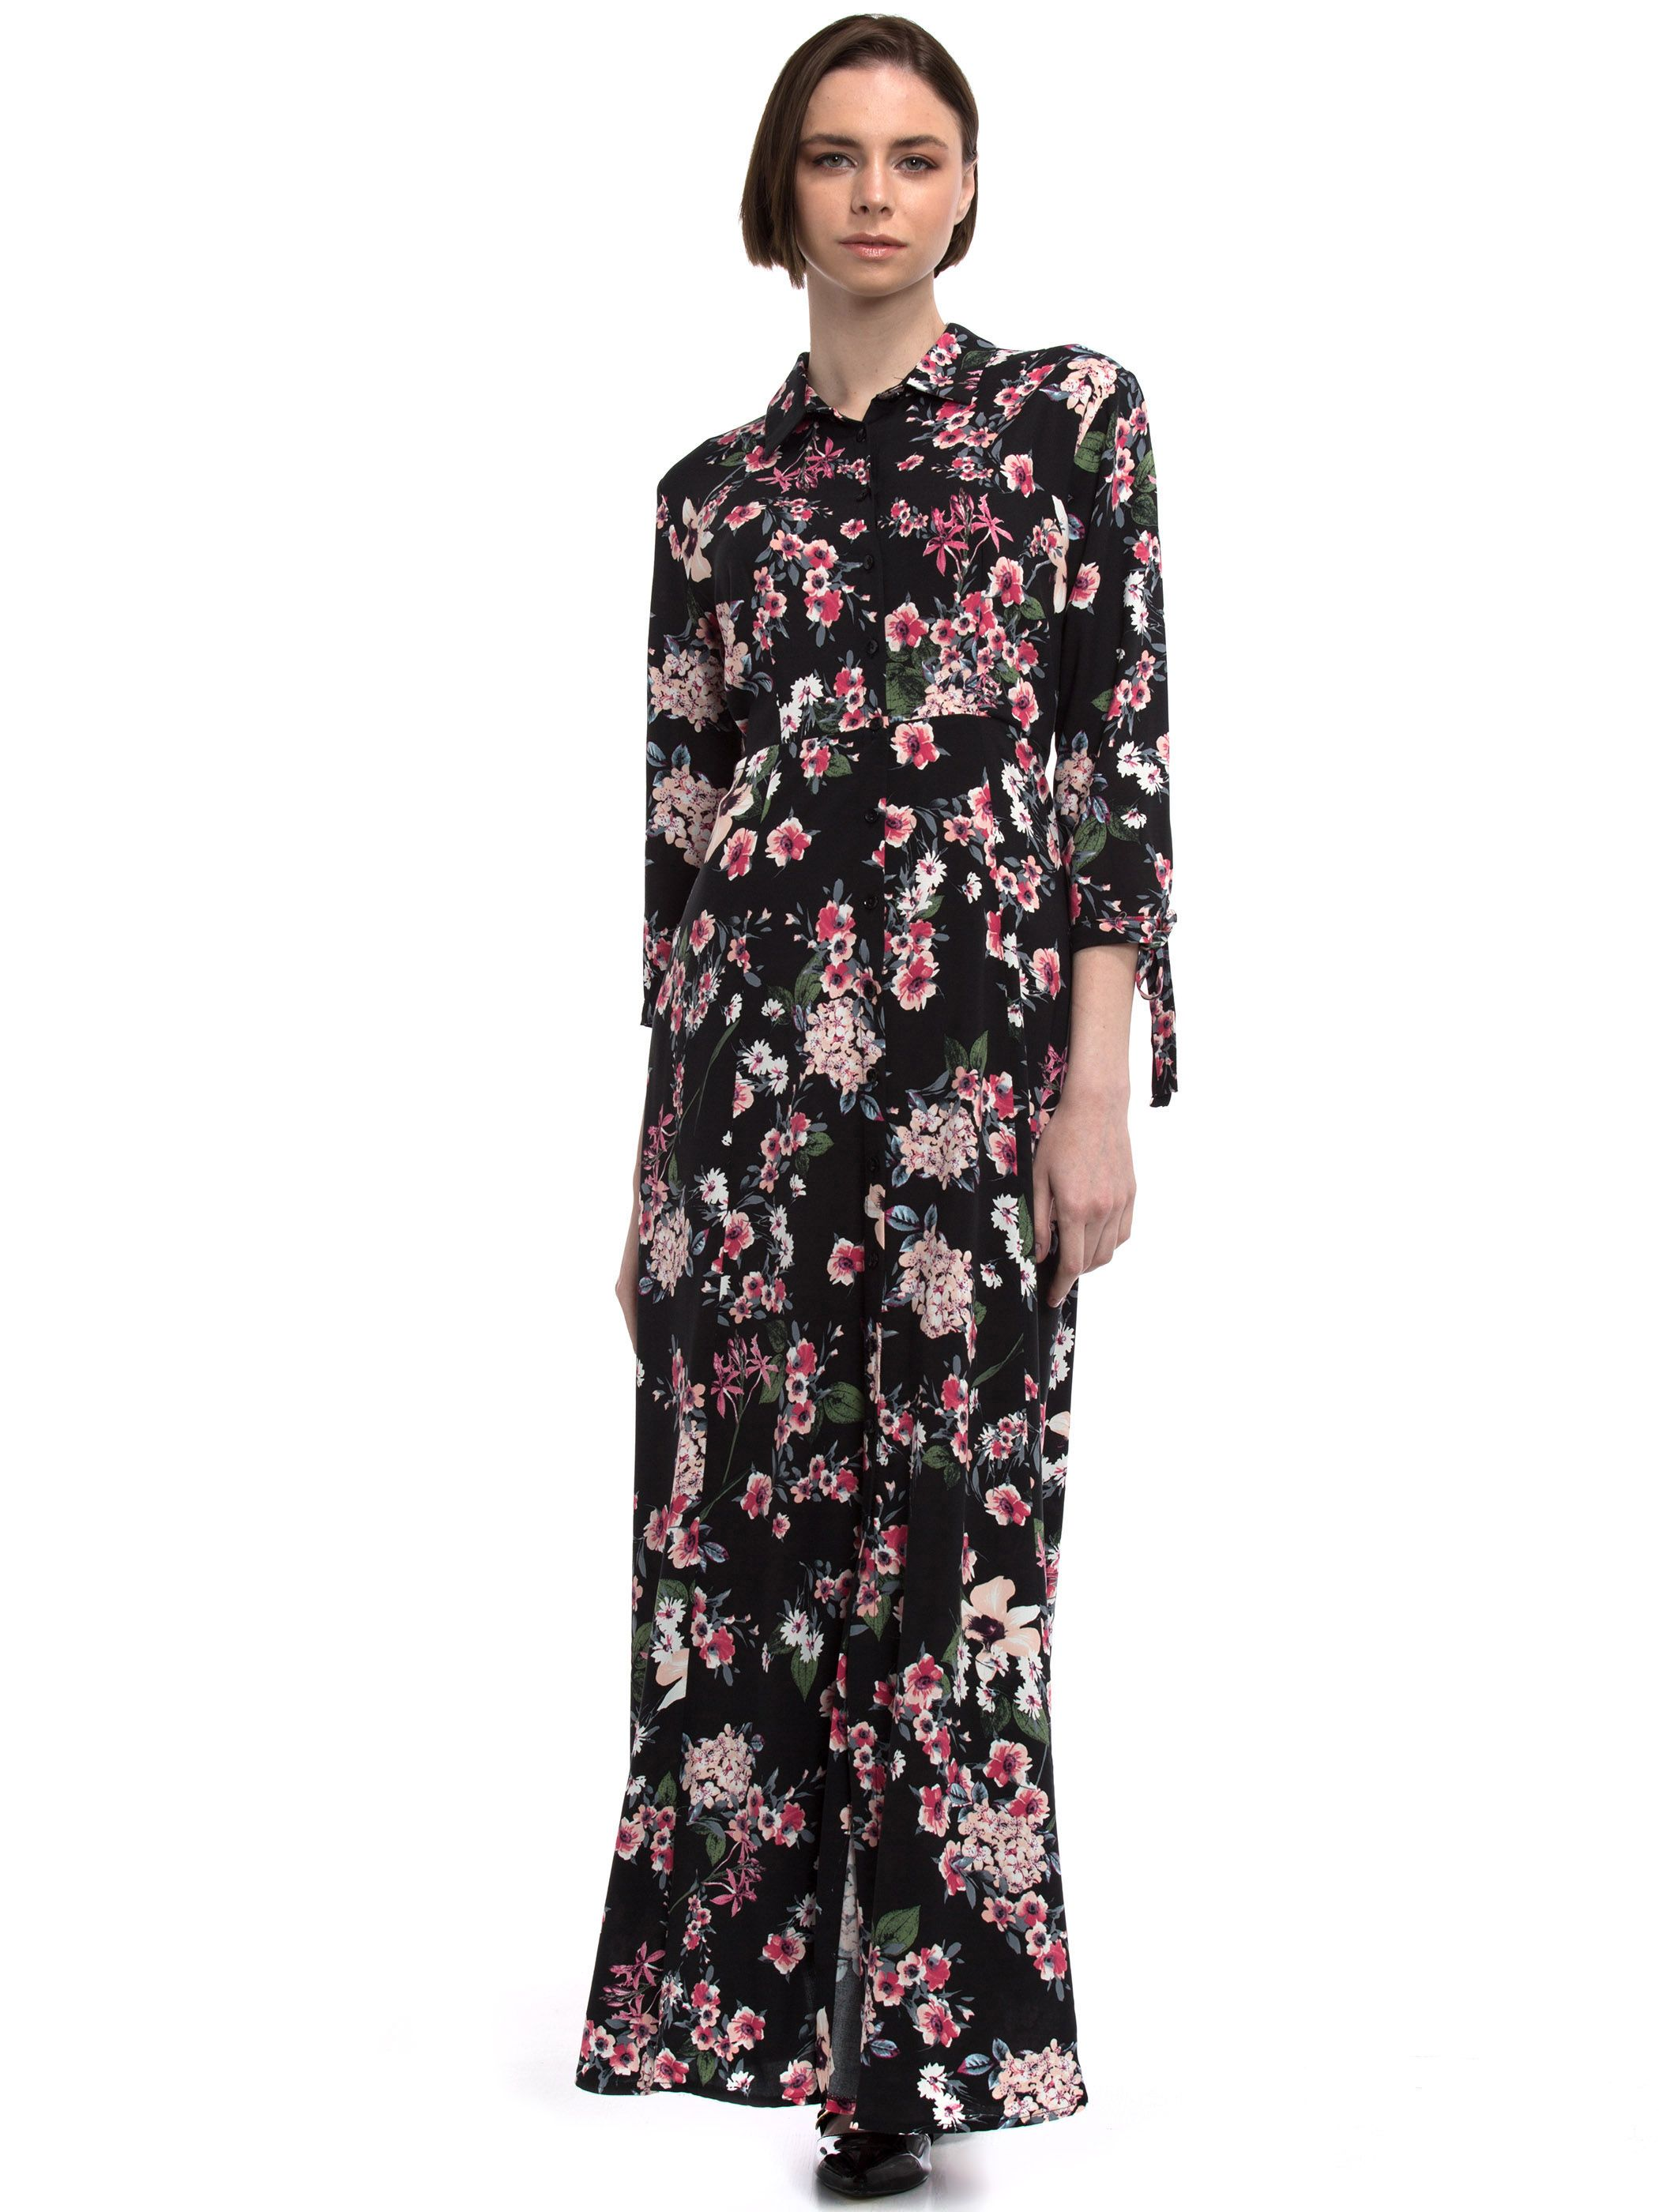 Black Long Patterned Long Sleeve Dress 7yb851z8 760 Lc Waikiki Dresses Long Sleeve Dress Fashion